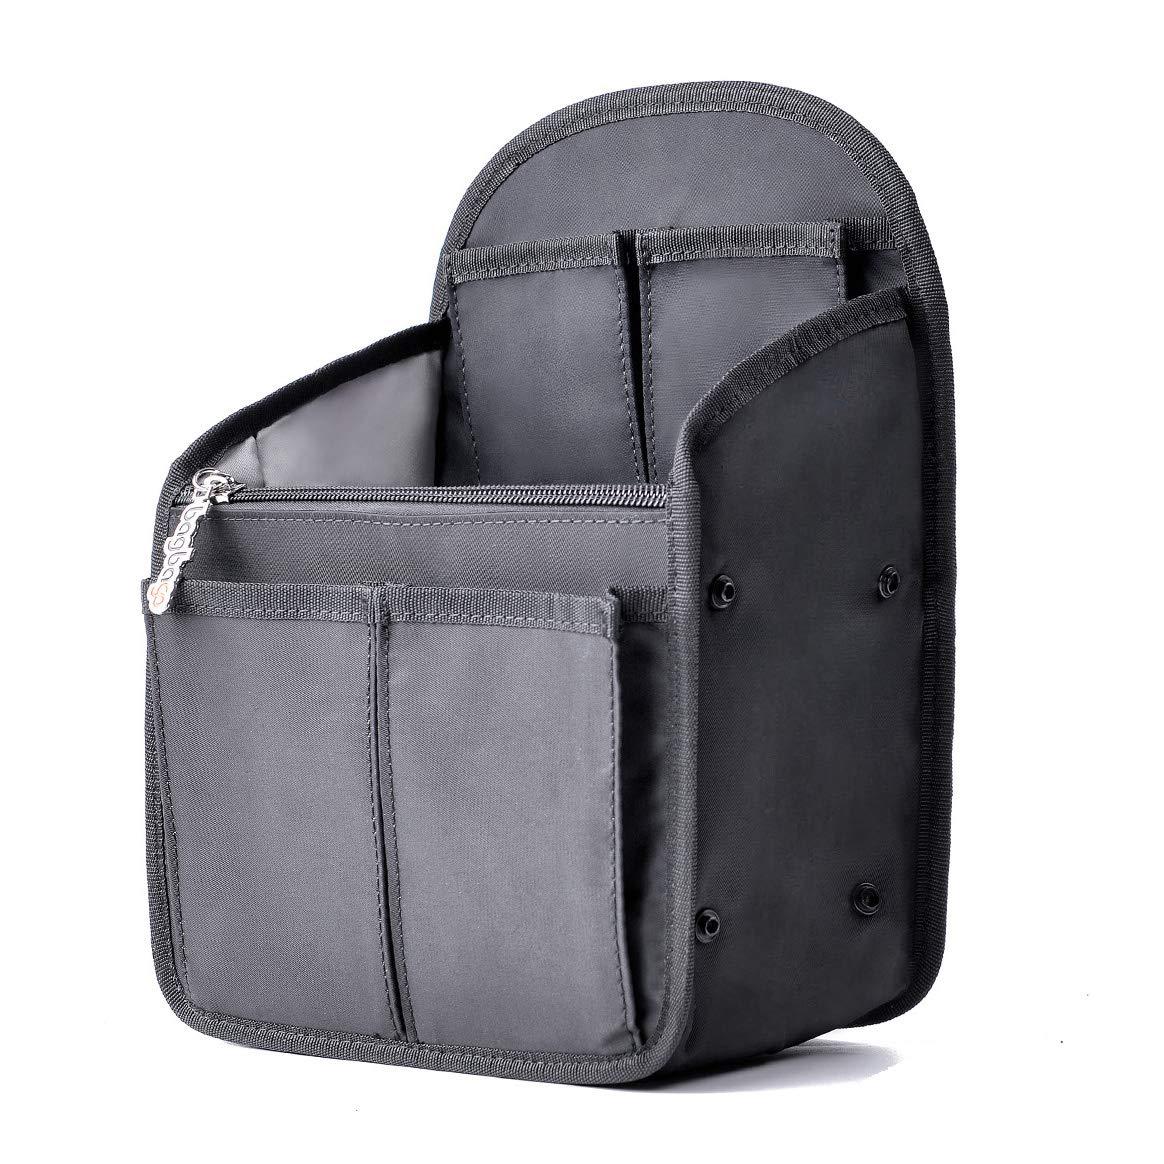 739fed633adc Backpack Organizer bag in bag Shoulders Bag Rucksack Insert fit Mini ...